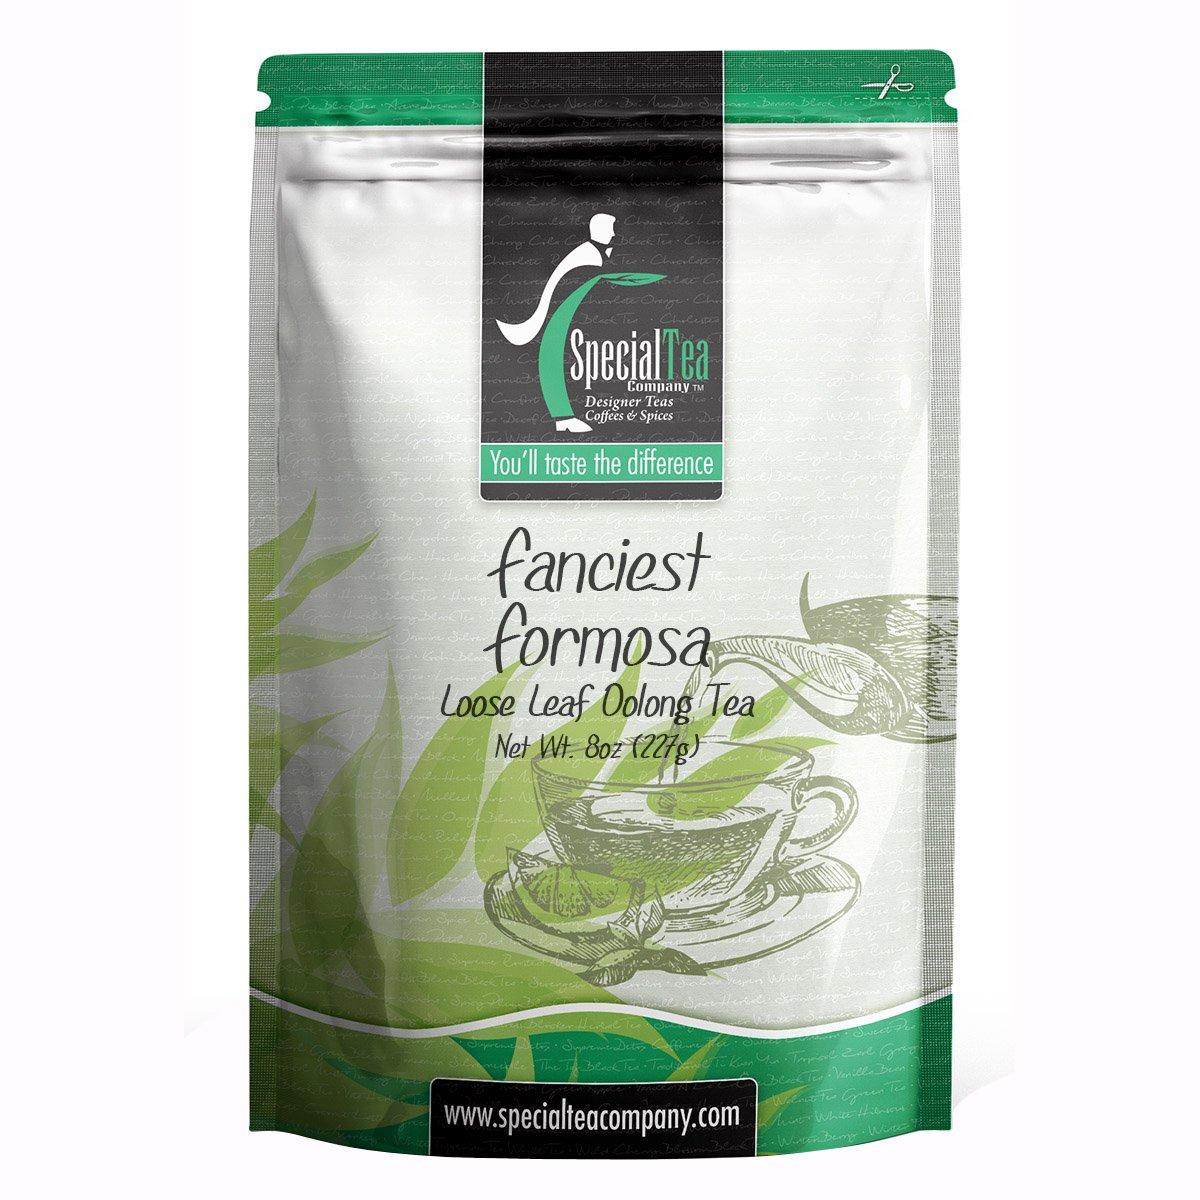 Special Tea Loose Leaf Tea, Fanciest formosa Oolong, 8 Ounce